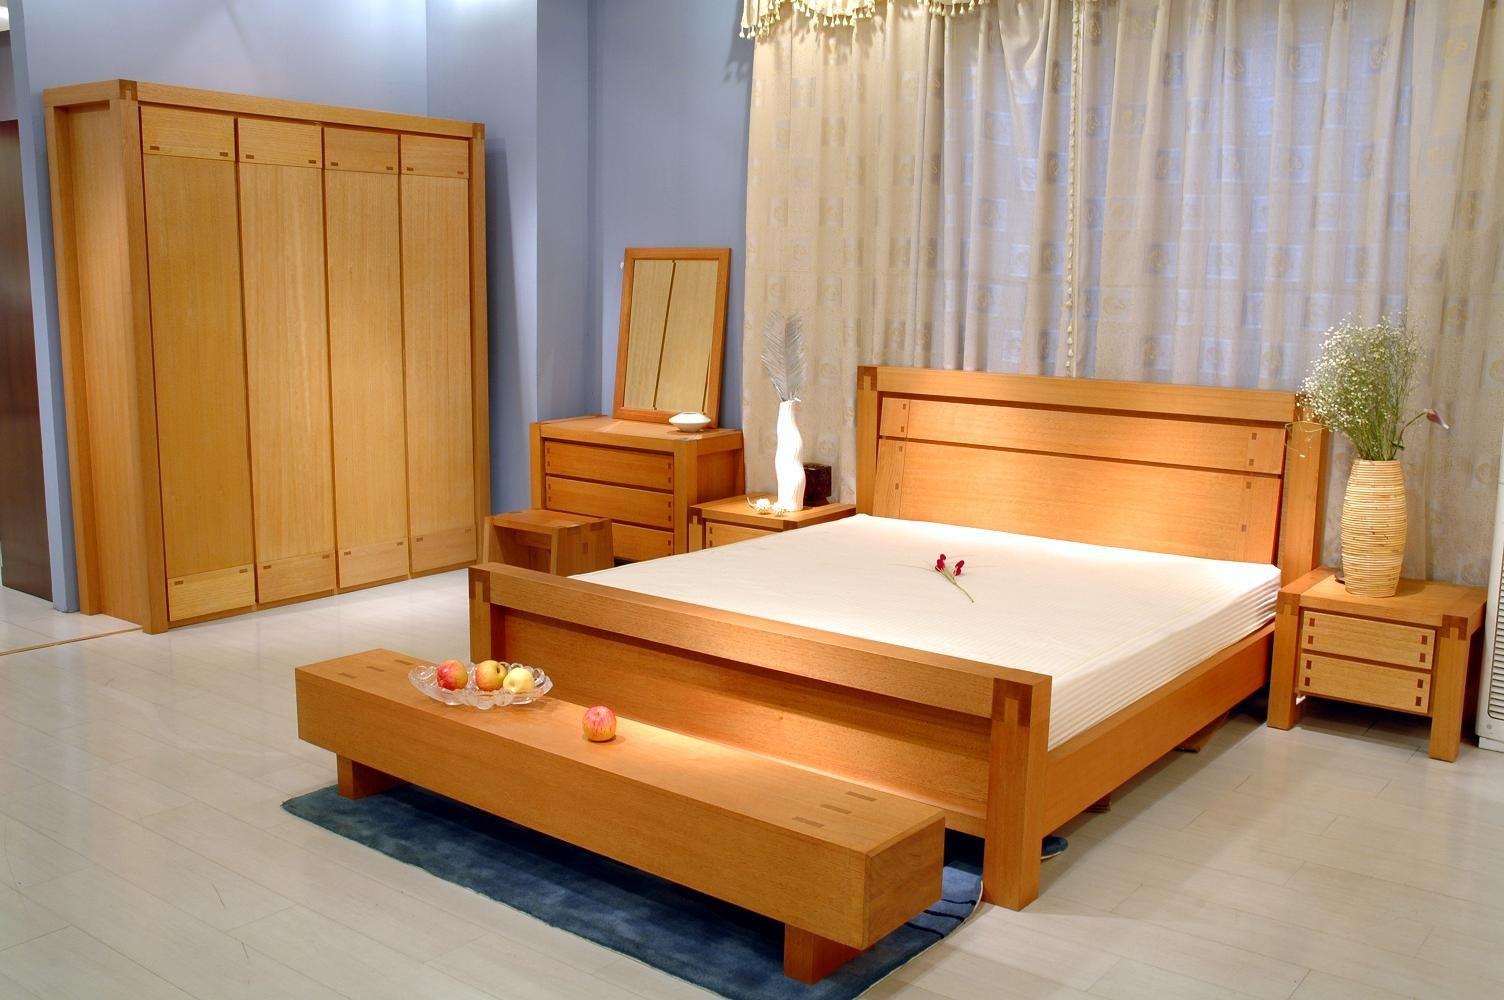 28 Ash Bedroom Furniture Toscana Ash Bedroom